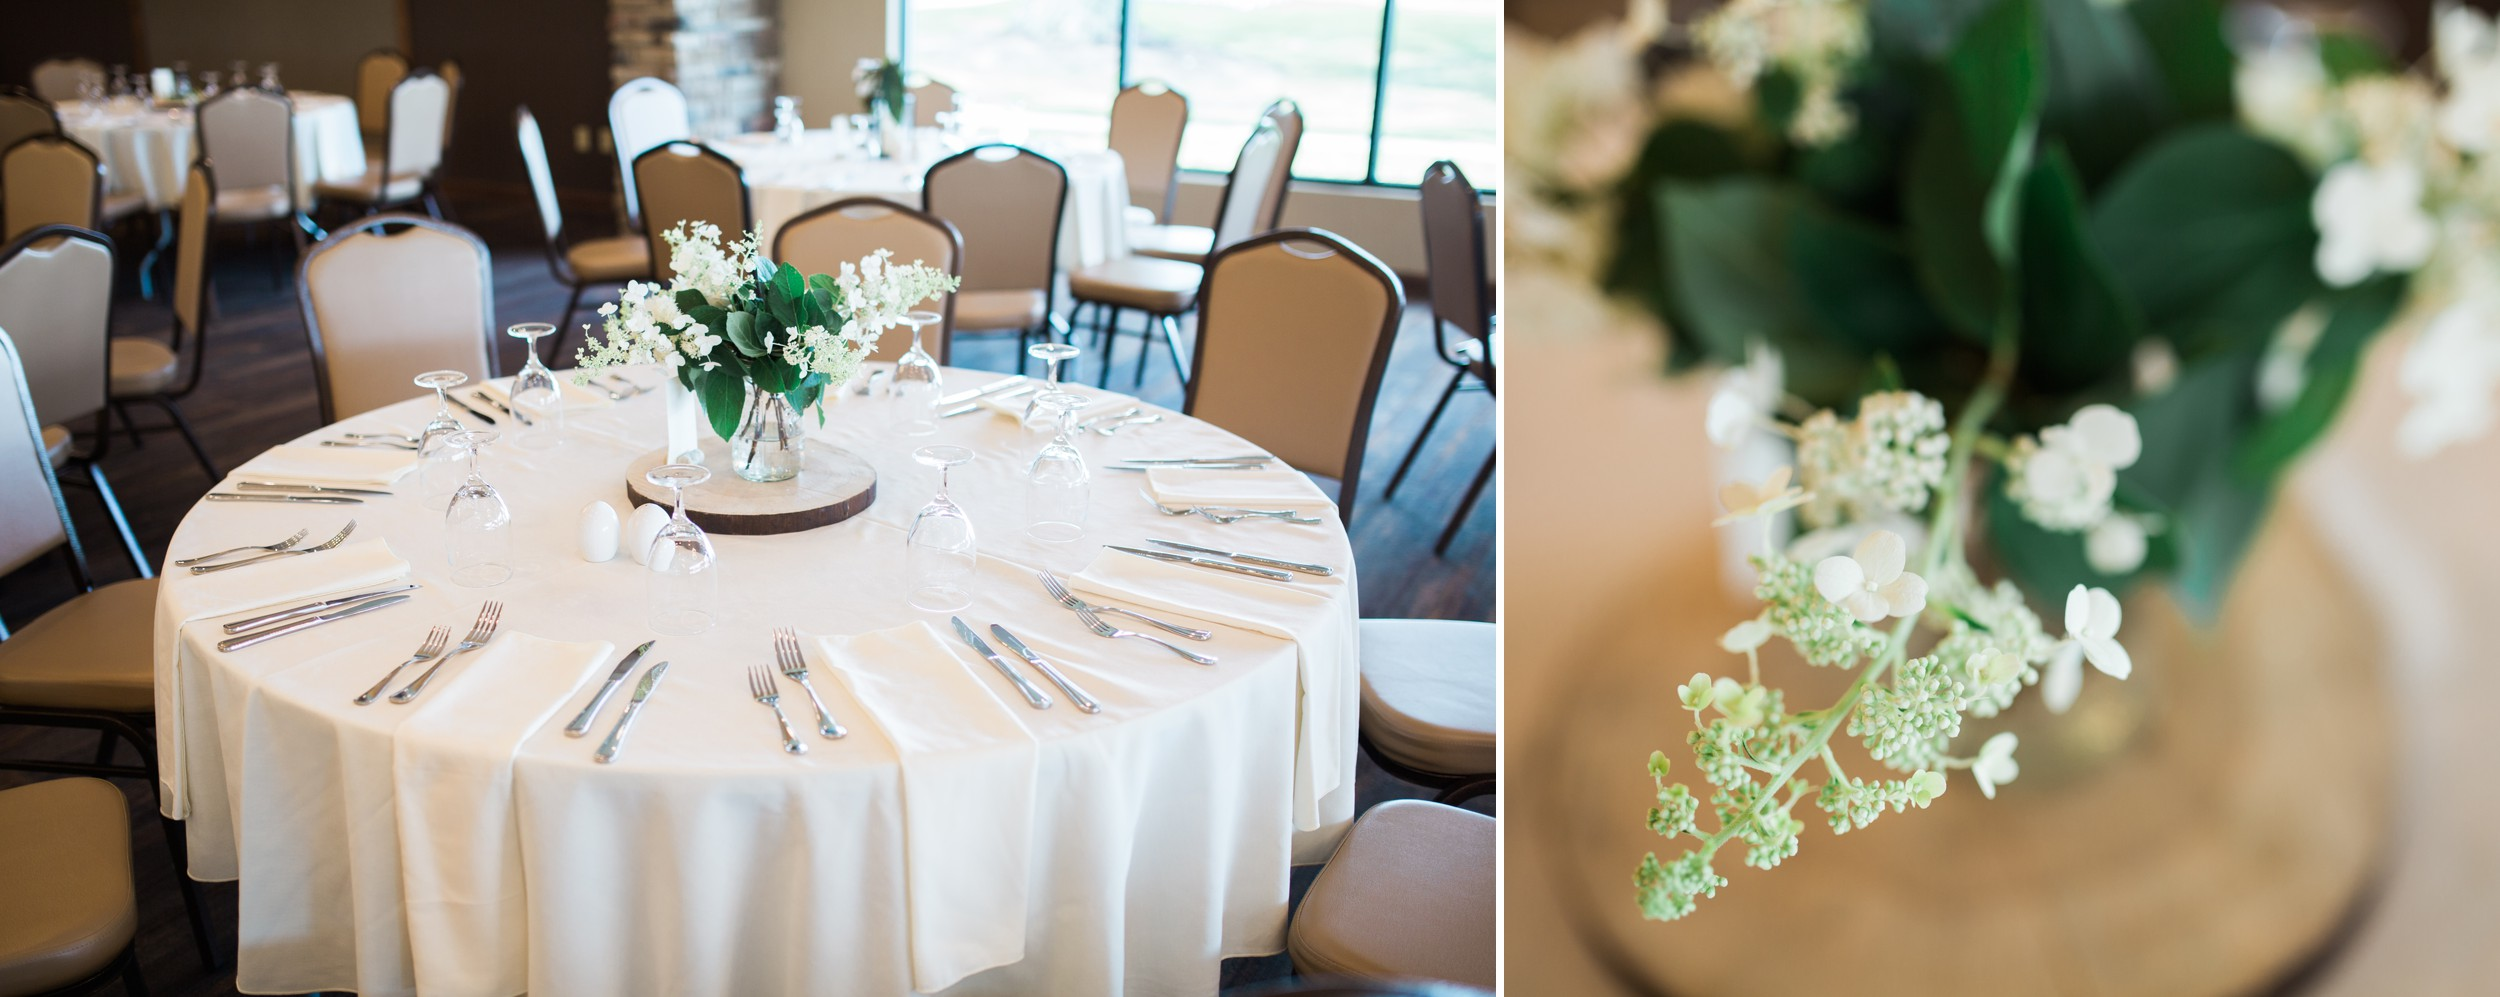 nick- and-martina-pine-lake-vinyards-tracylynn-photography-columbiana-ohio-wedding 2.jpg